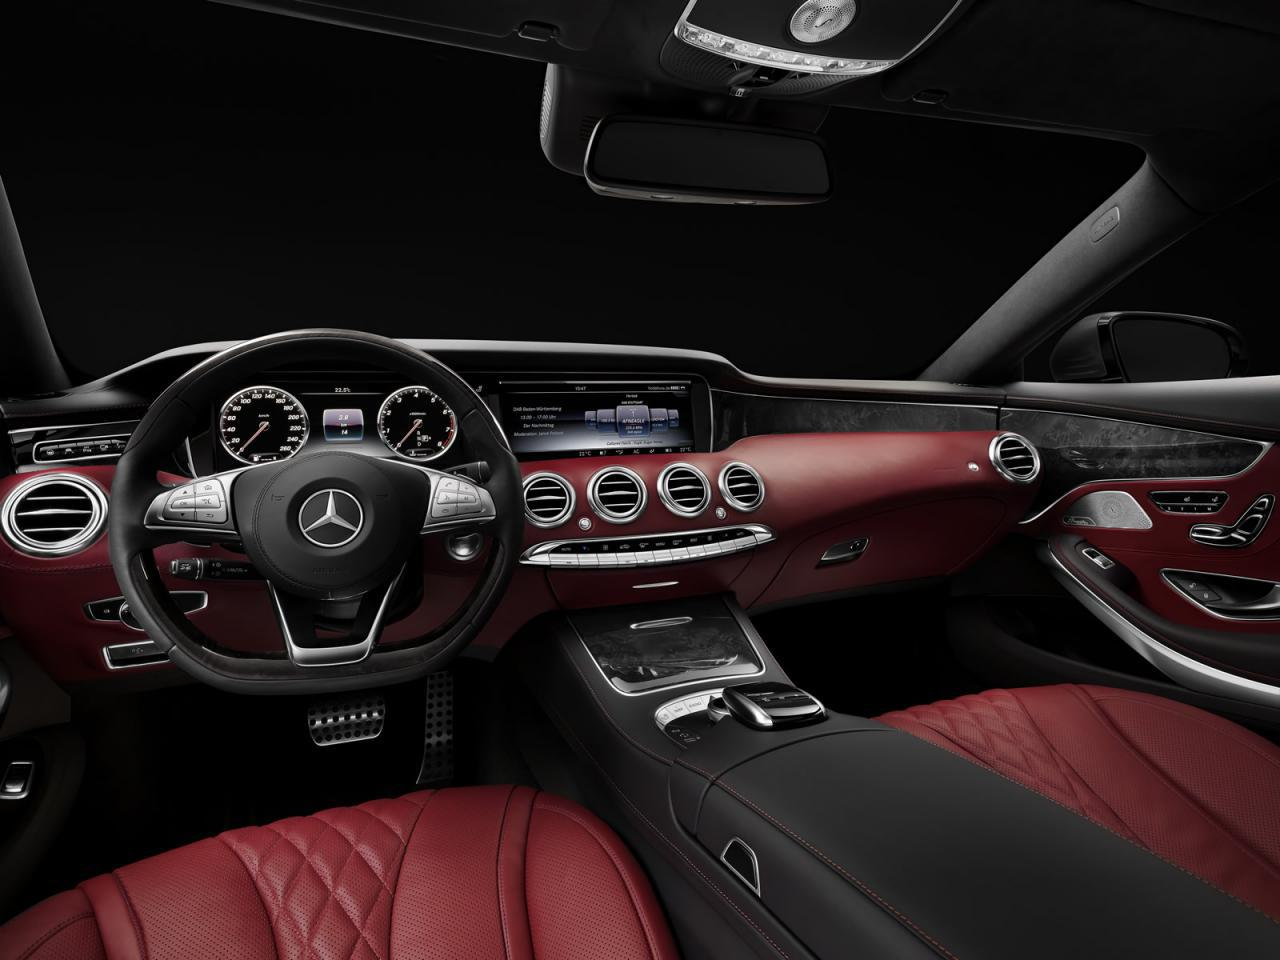 Mercedes Benz S-Class C222 - S-Coupe